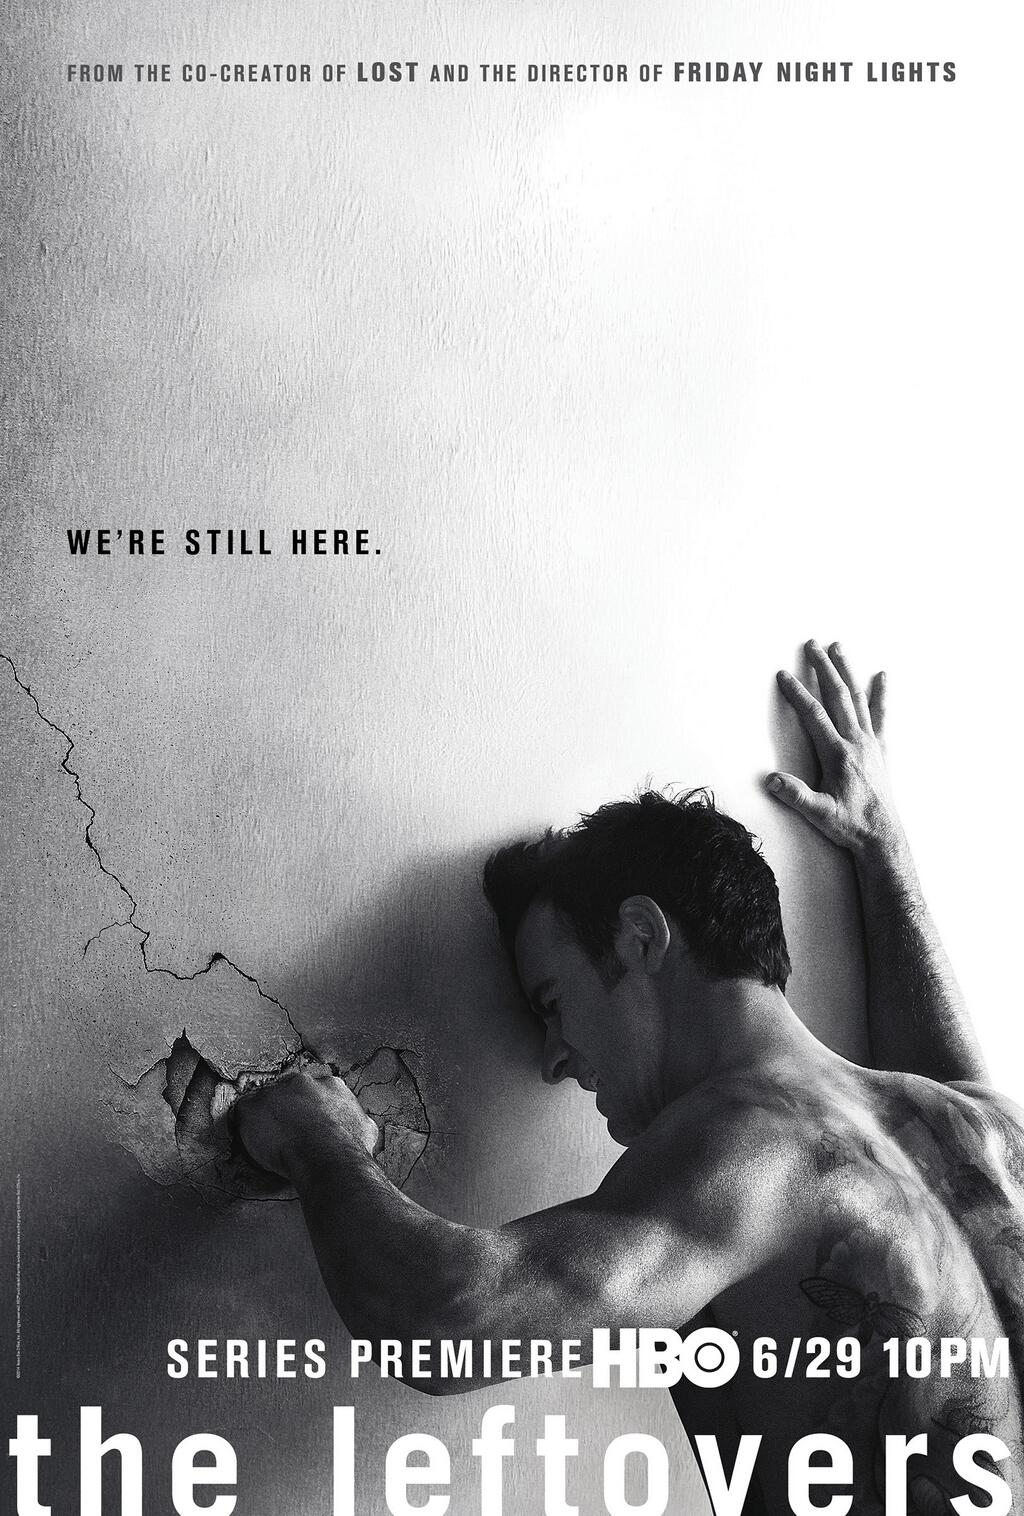 Poster de The Leftovers de Damon Lindelof de HBO, basado en la novela original de Tom Perotta.